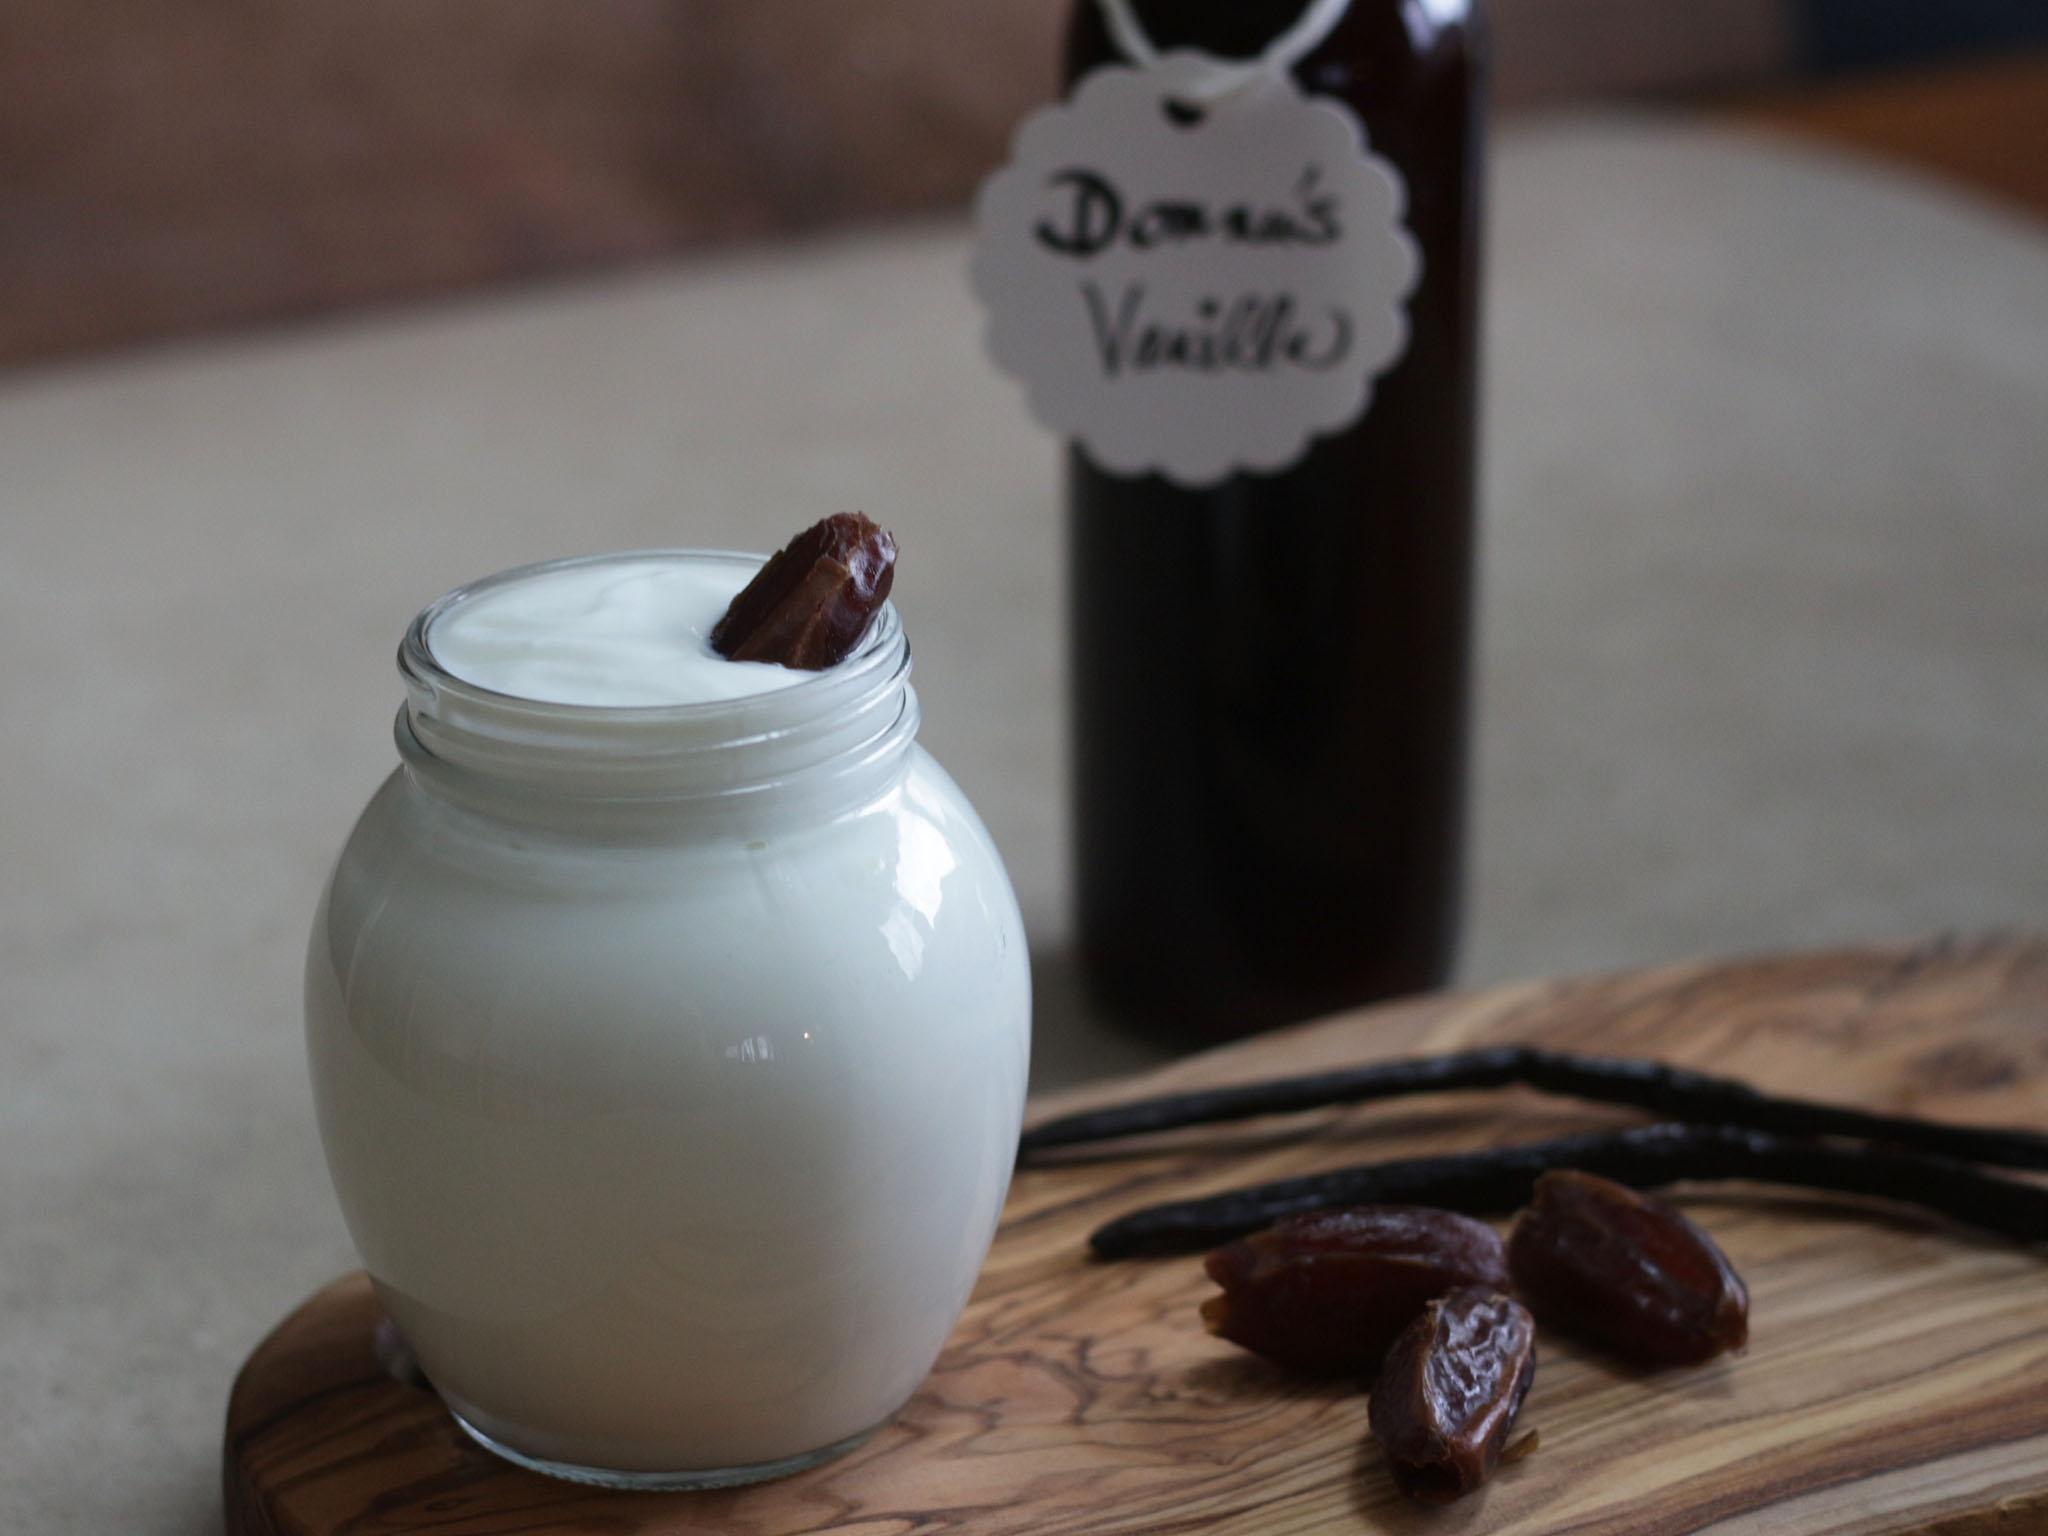 dates and vanilla copy